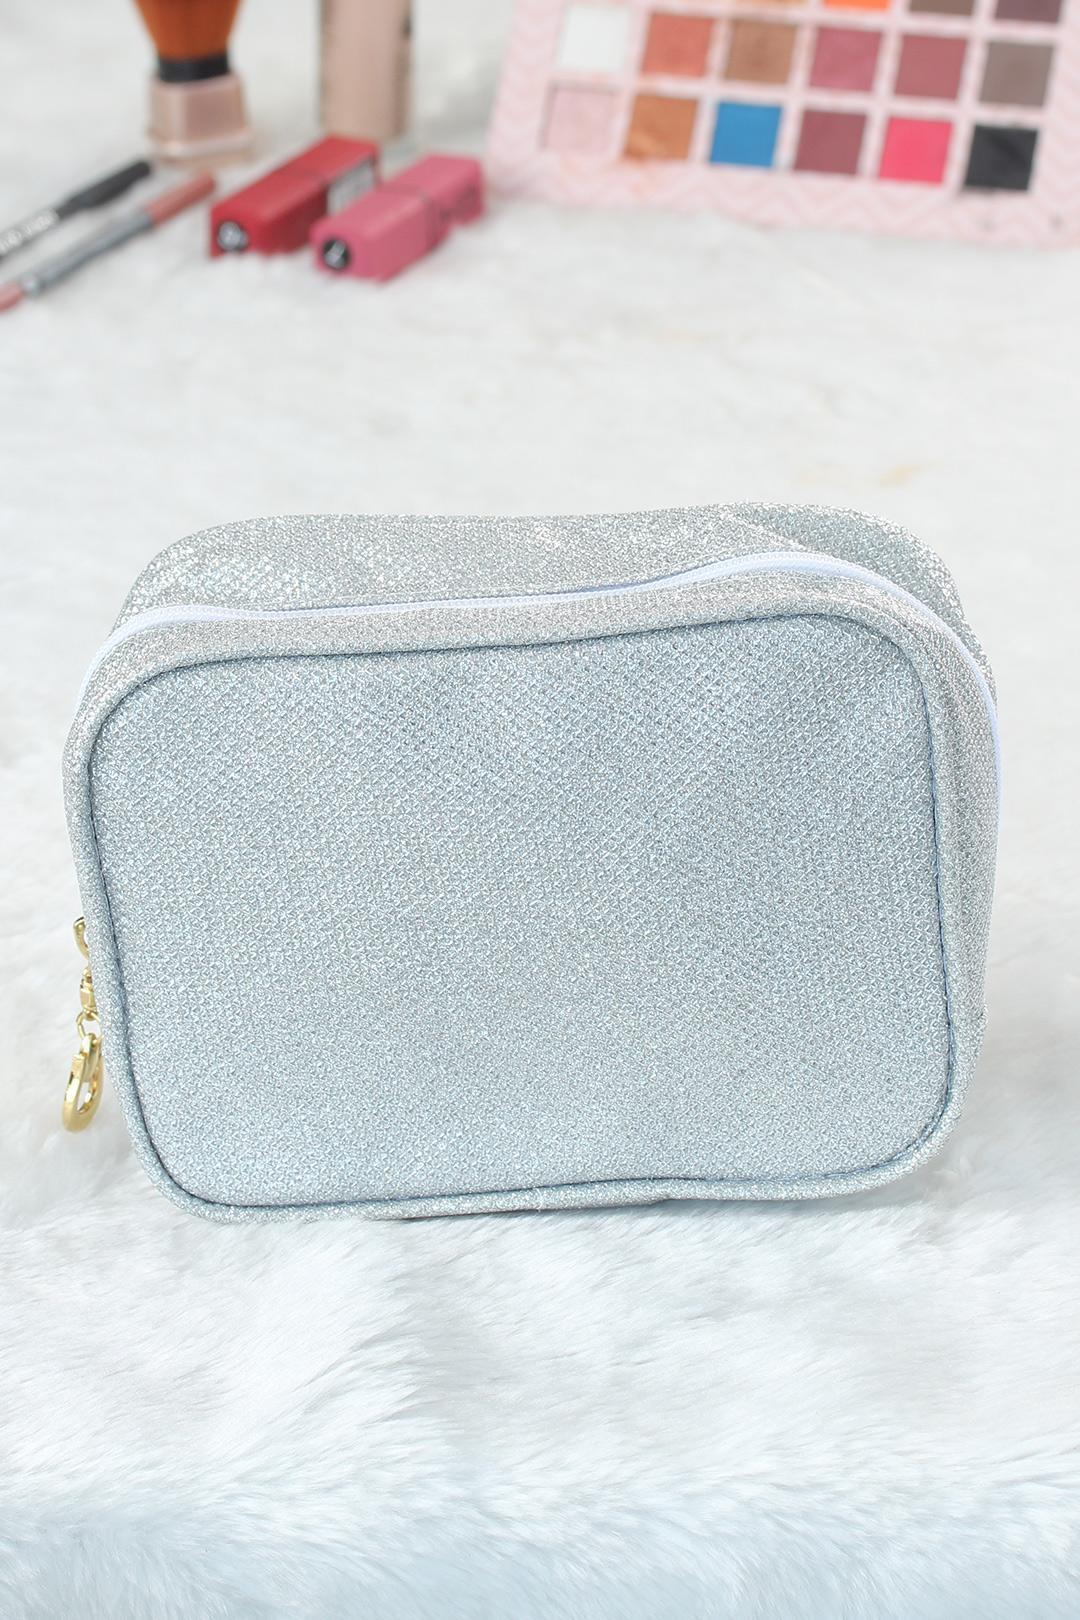 Women's Glitter Square Makeup Bag